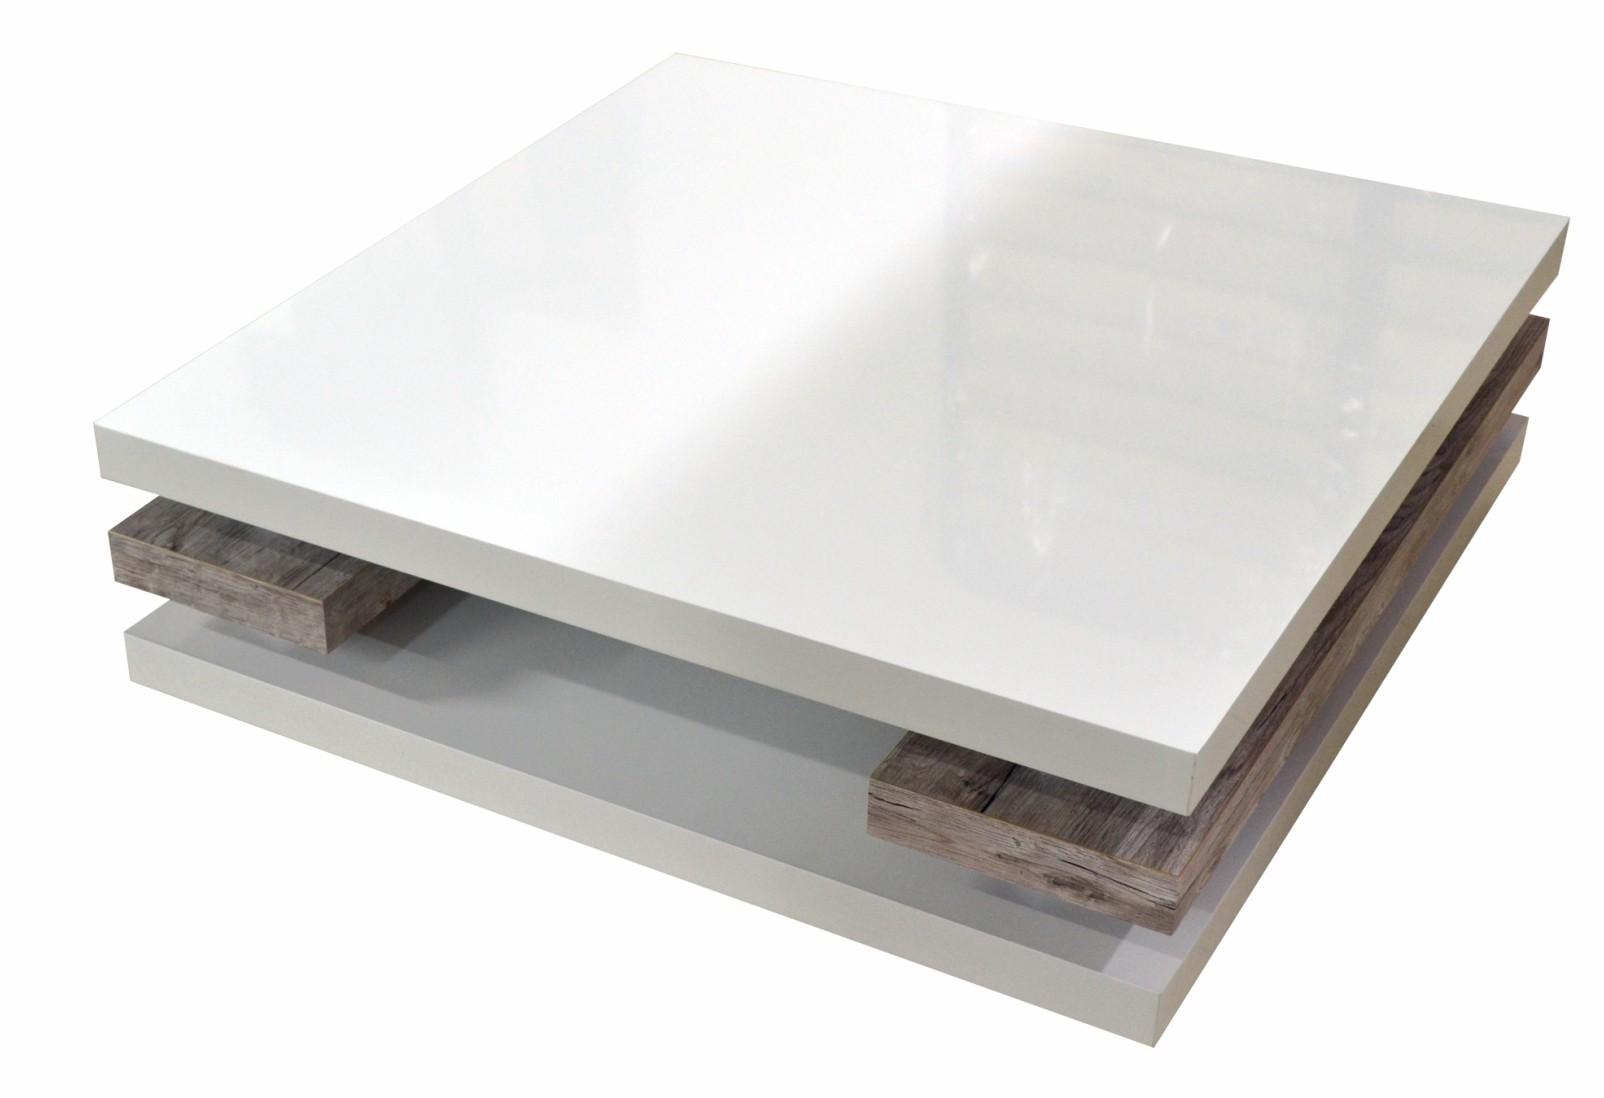 table basse r versible naturel ou gris kartz mod le r versible. Black Bedroom Furniture Sets. Home Design Ideas